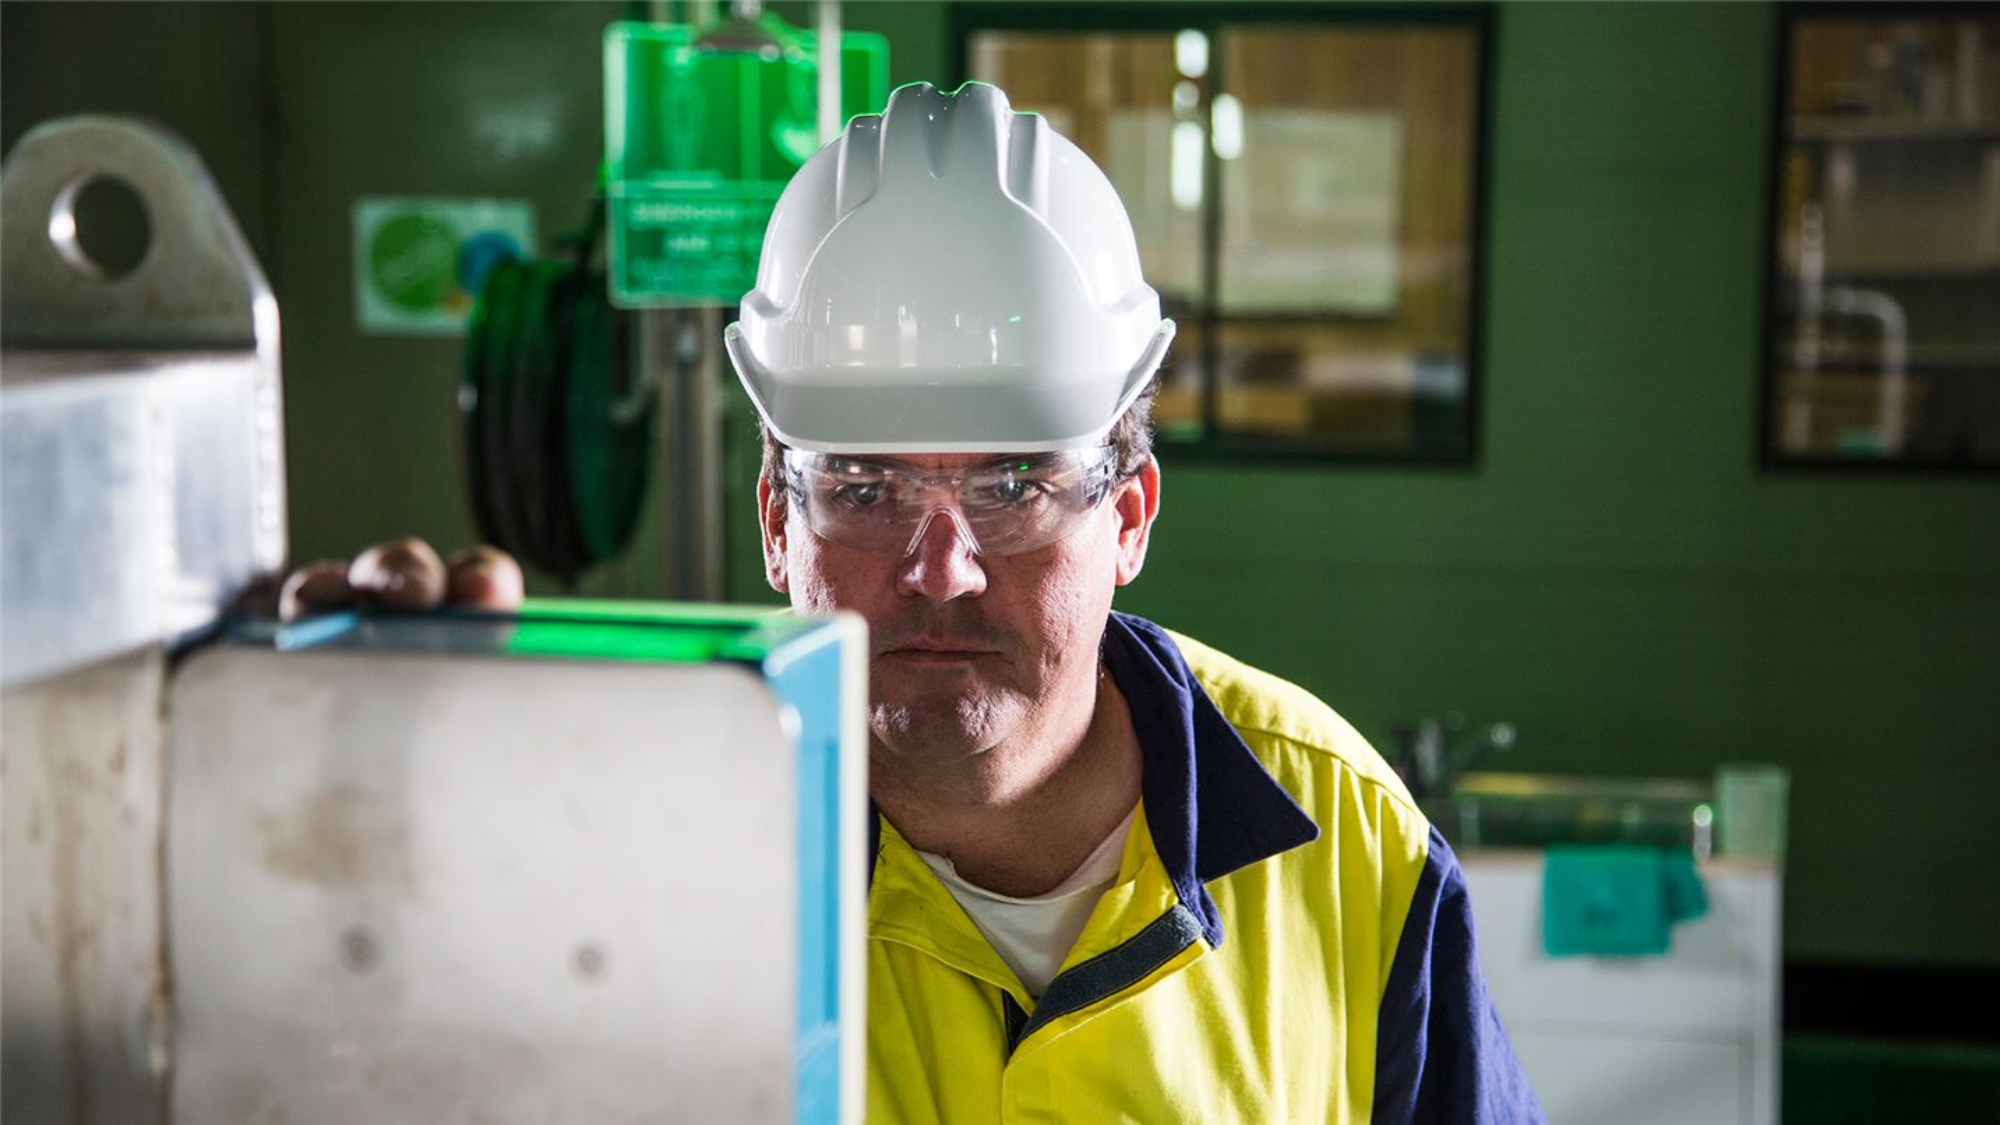 Employee operating plant